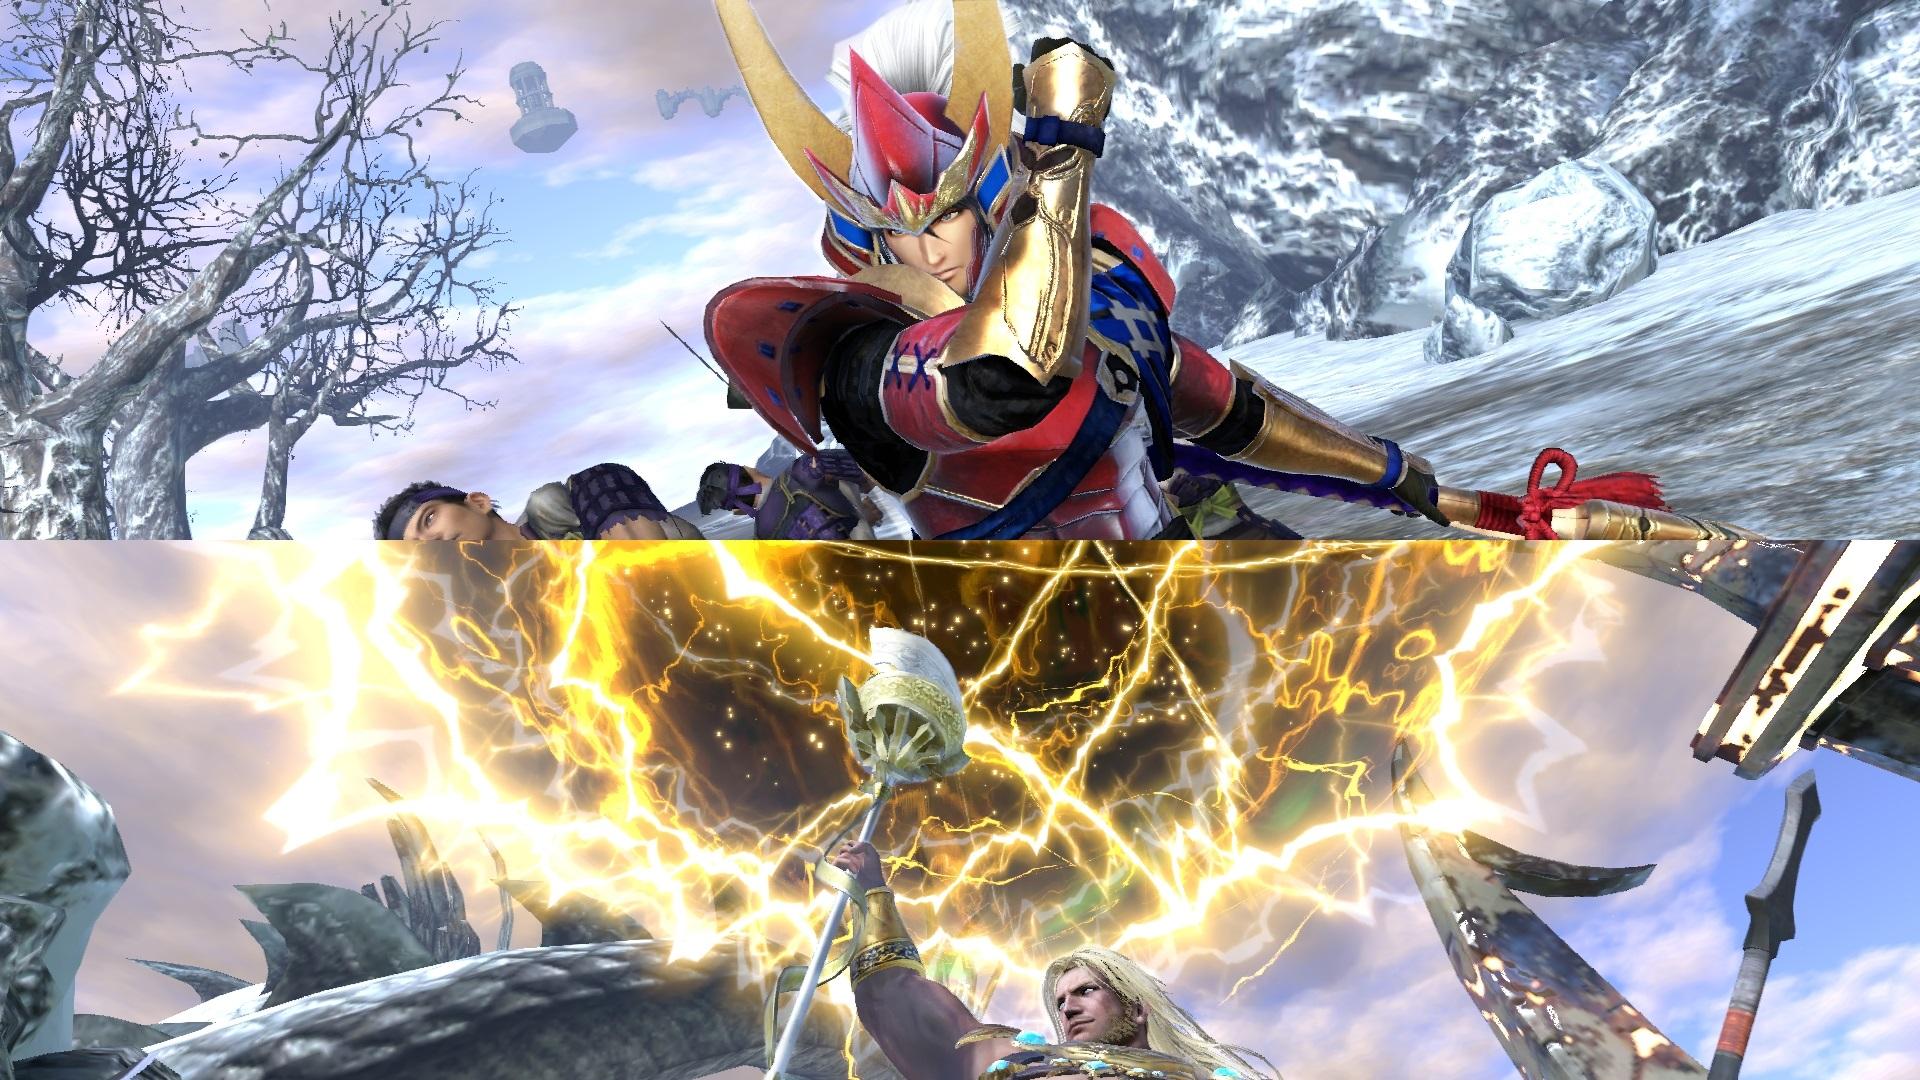 Warriors Orochi 4 Release Date Announced by KOEI TECMO ...